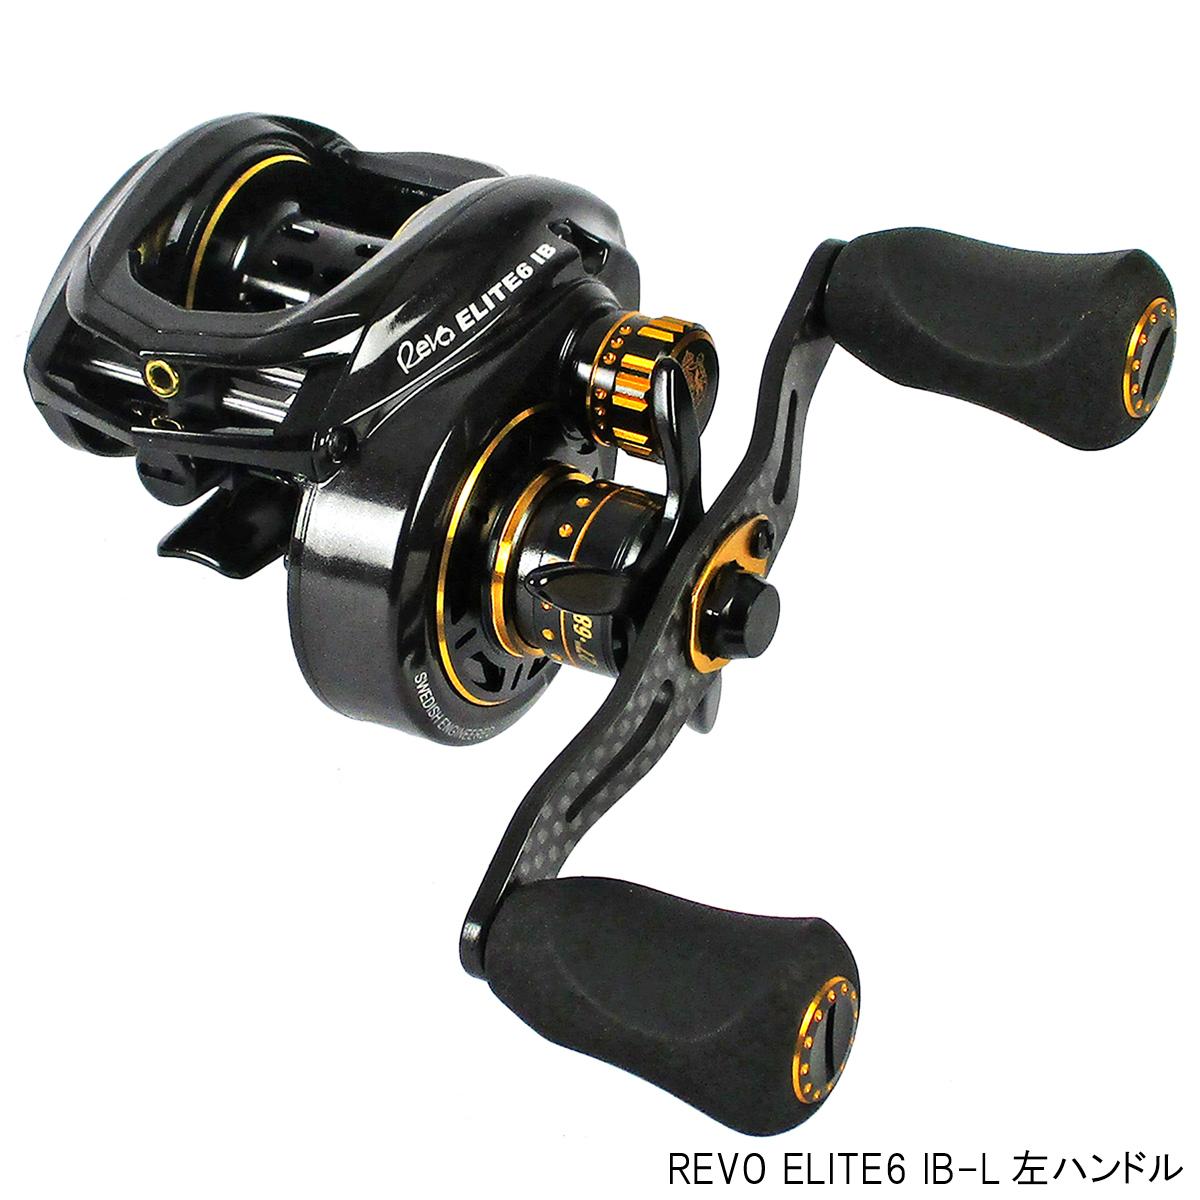 REVO ELITE6 IB-L 左ハンドル